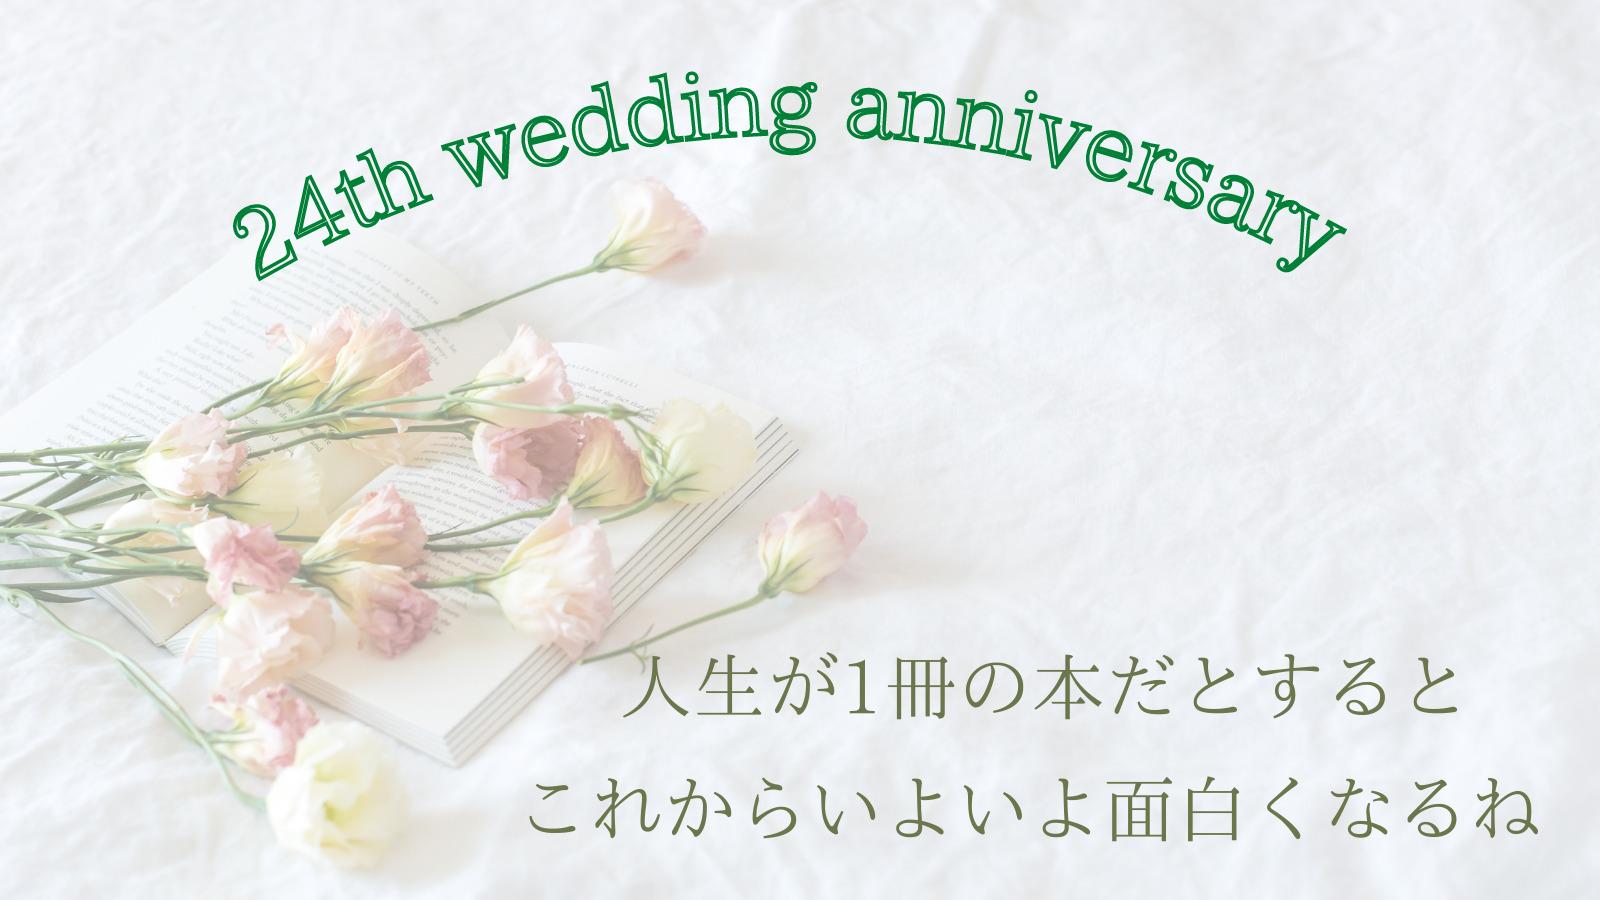 24th wedding anniversary